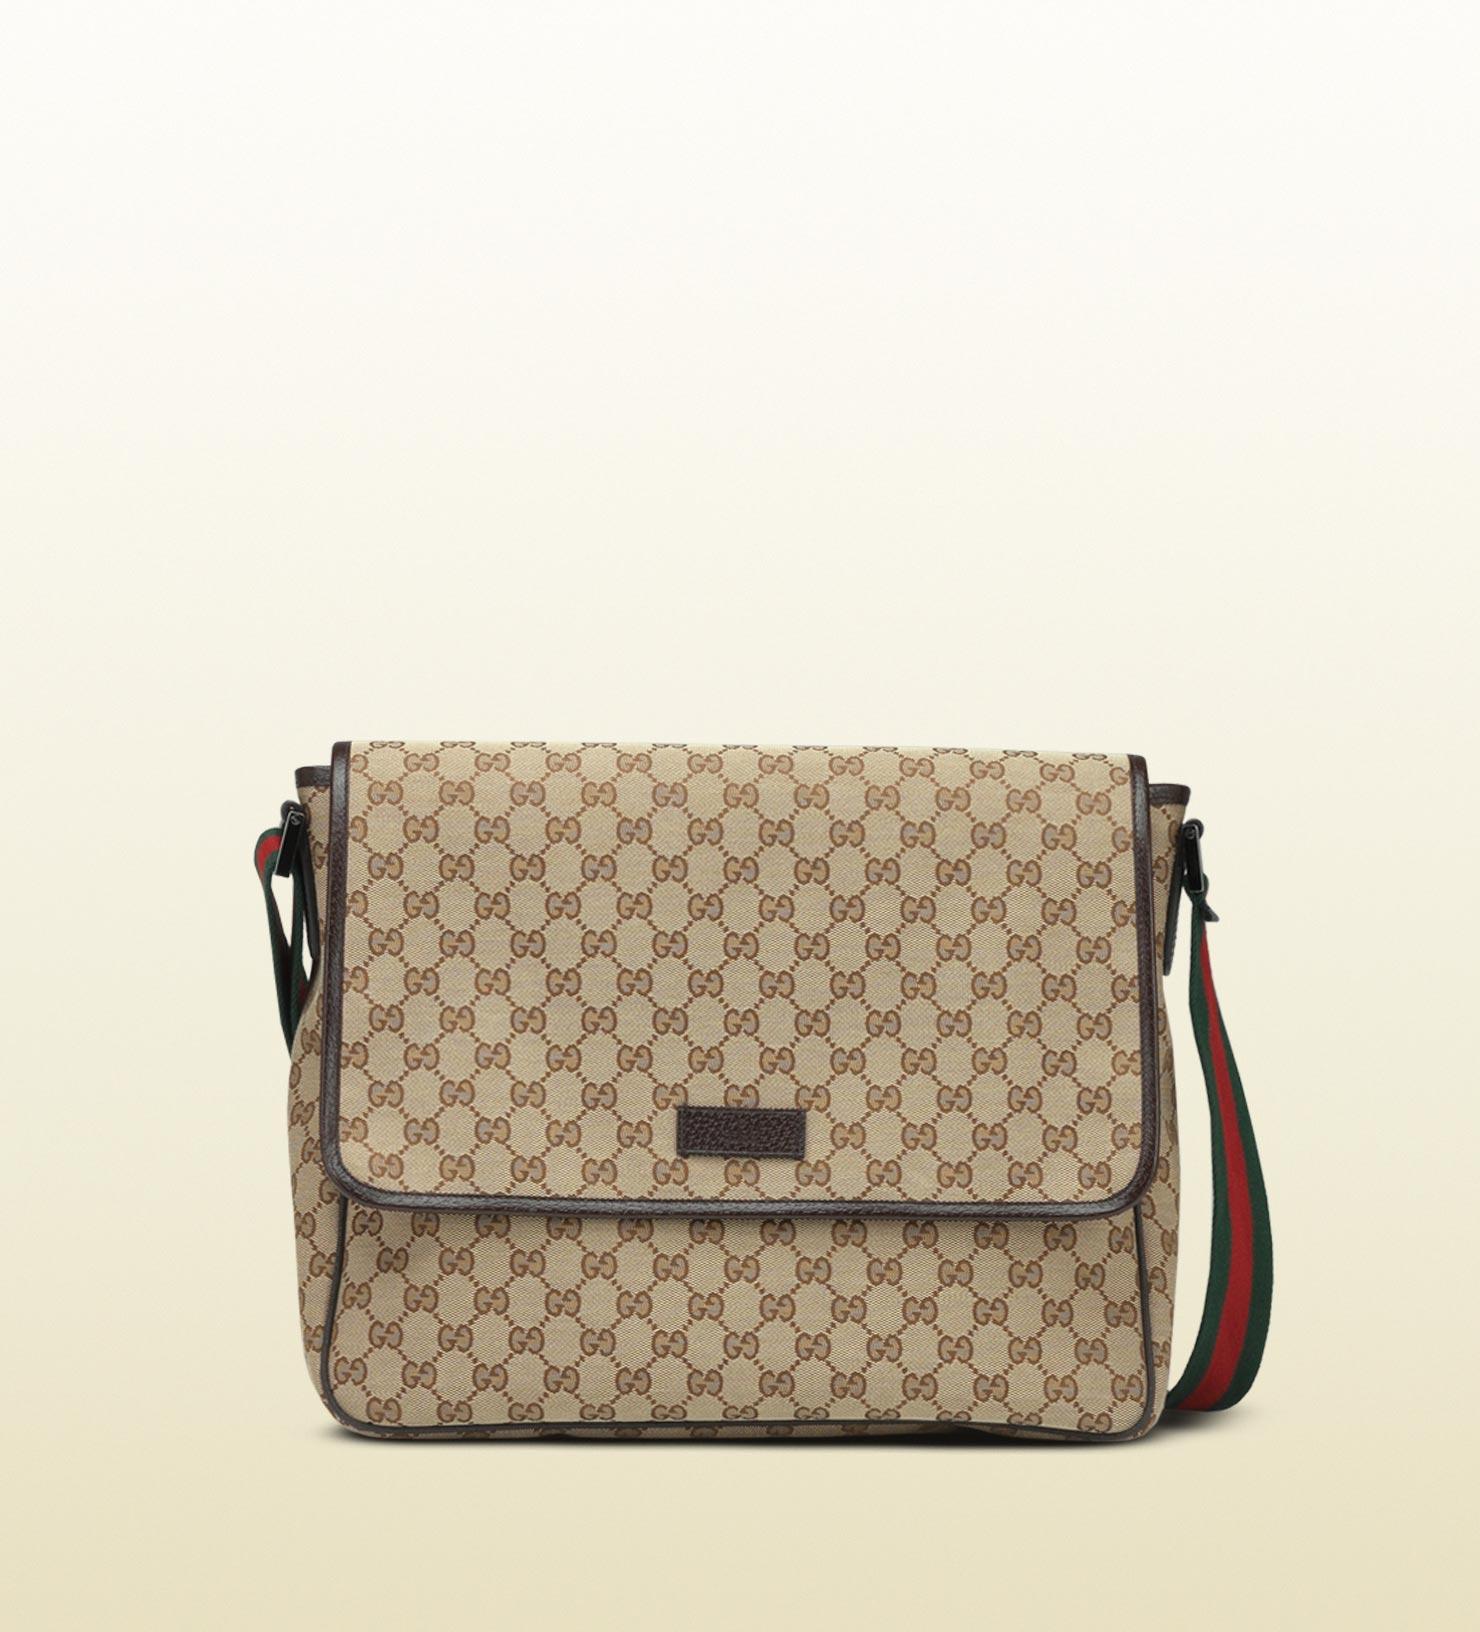 replica bottega veneta handbags wallet dooney youtube